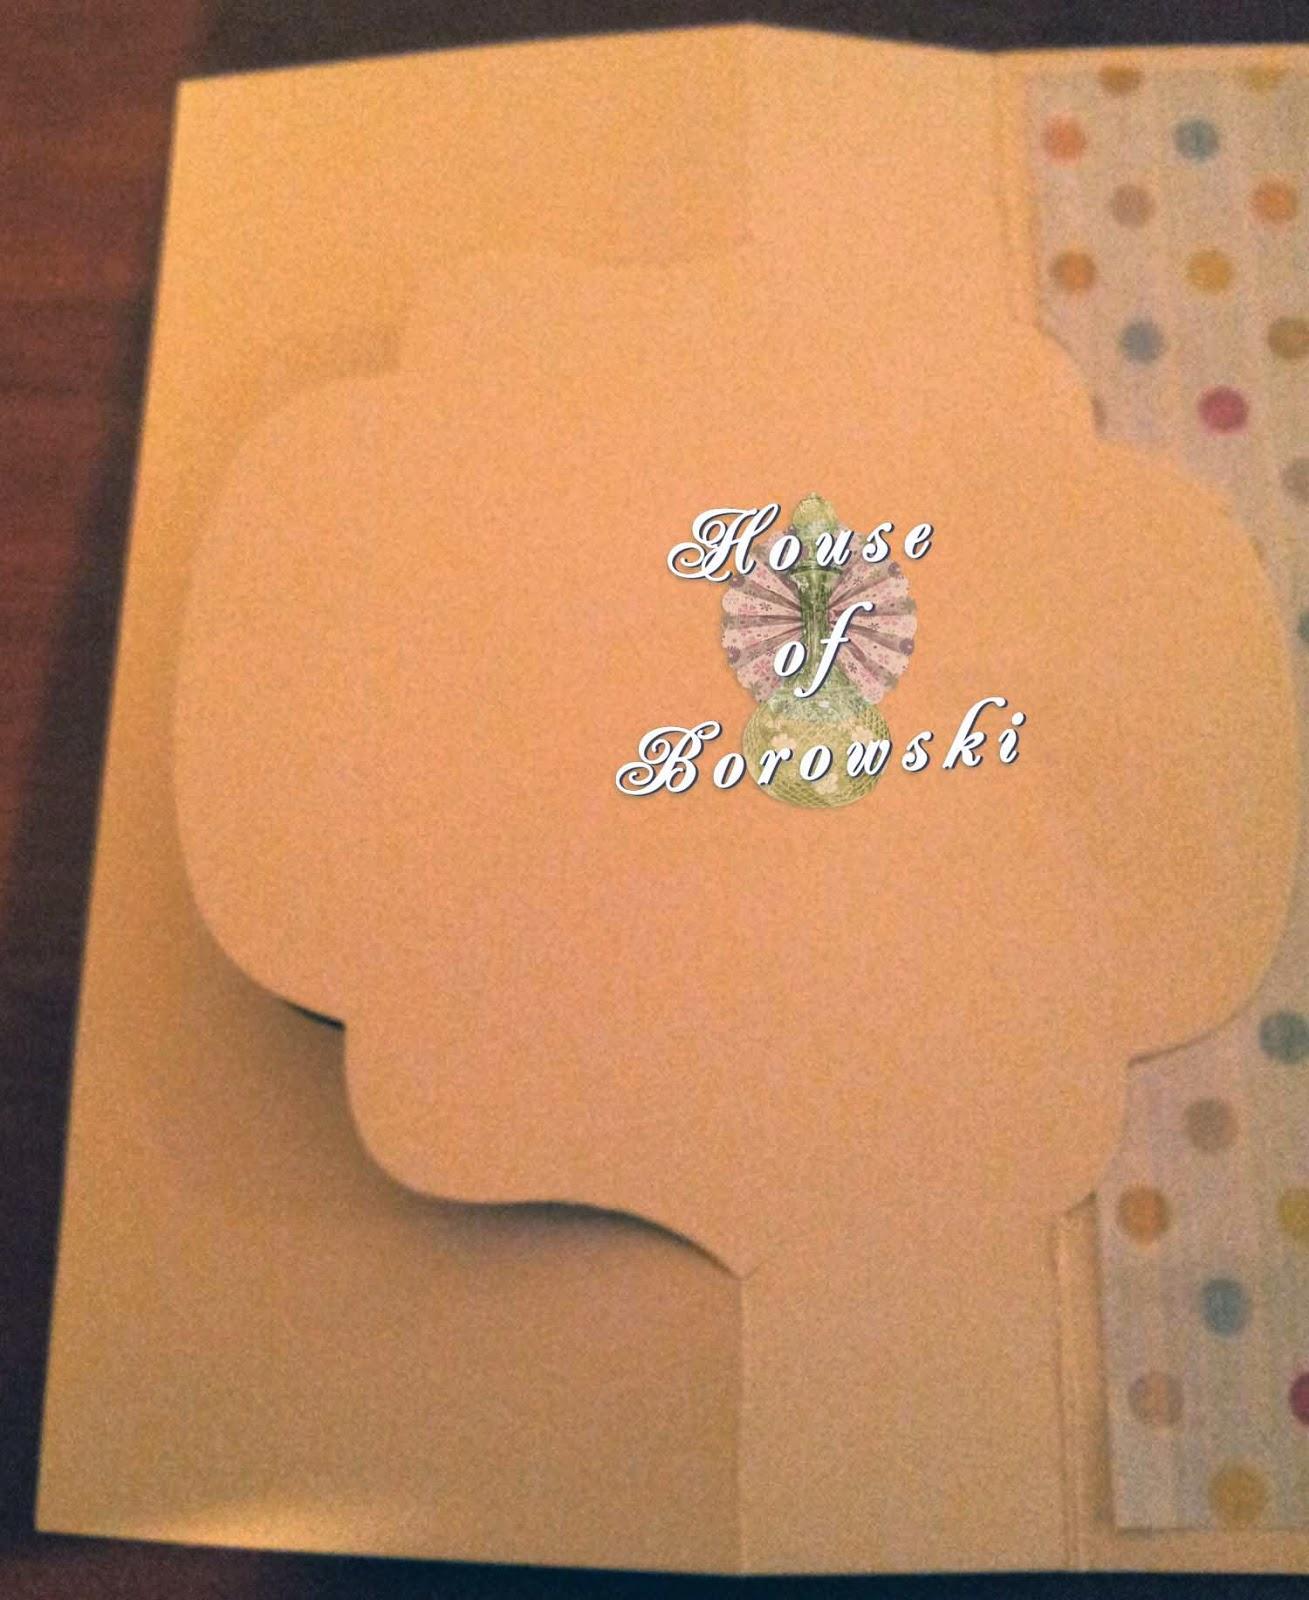 Die Cut Divas, House of Borowski, Bugaboo Edward Present, flip flop card.